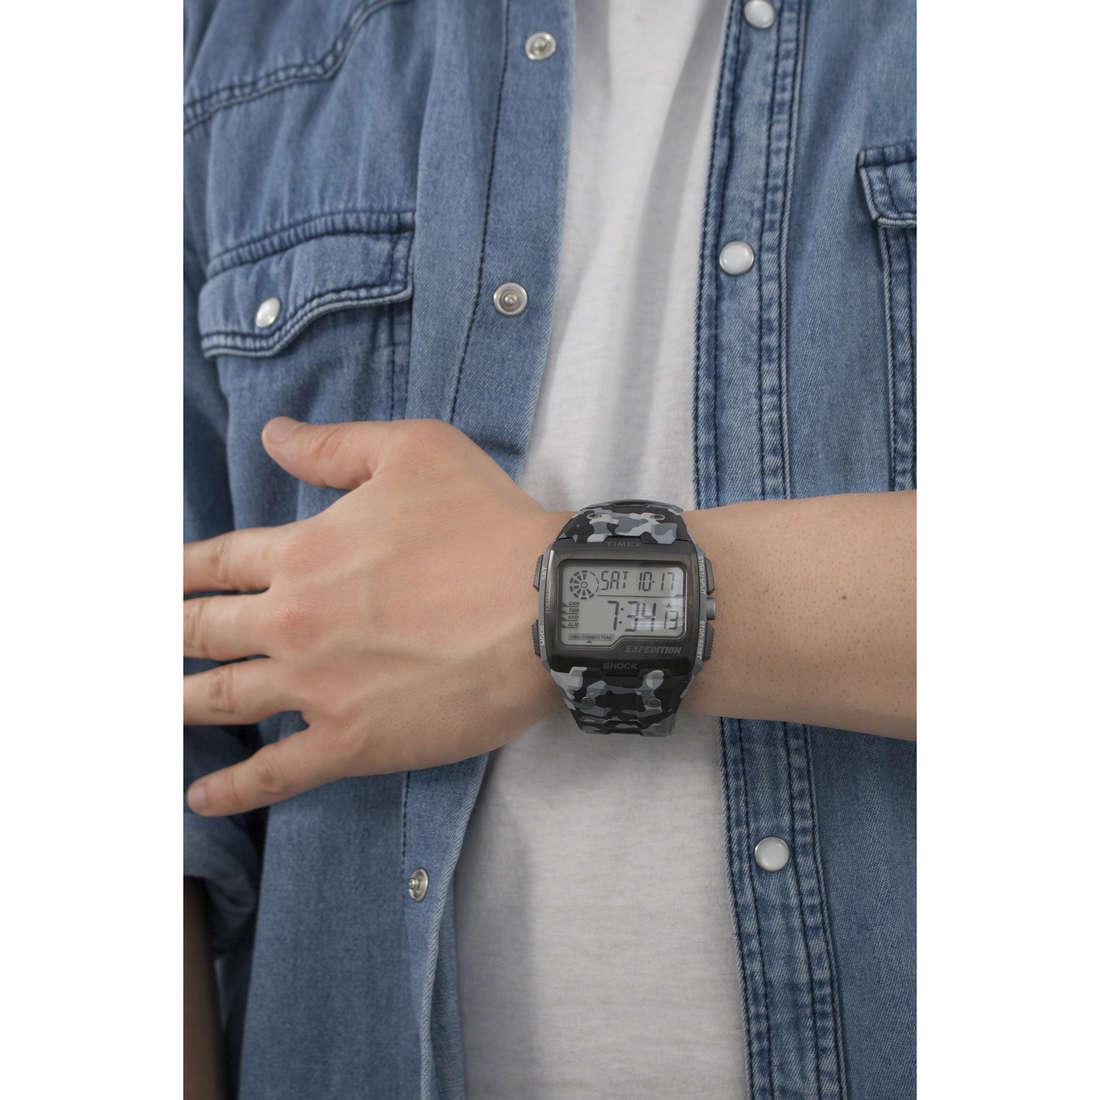 Timex digitali Grid Shock uomo TW4B03000 indosso